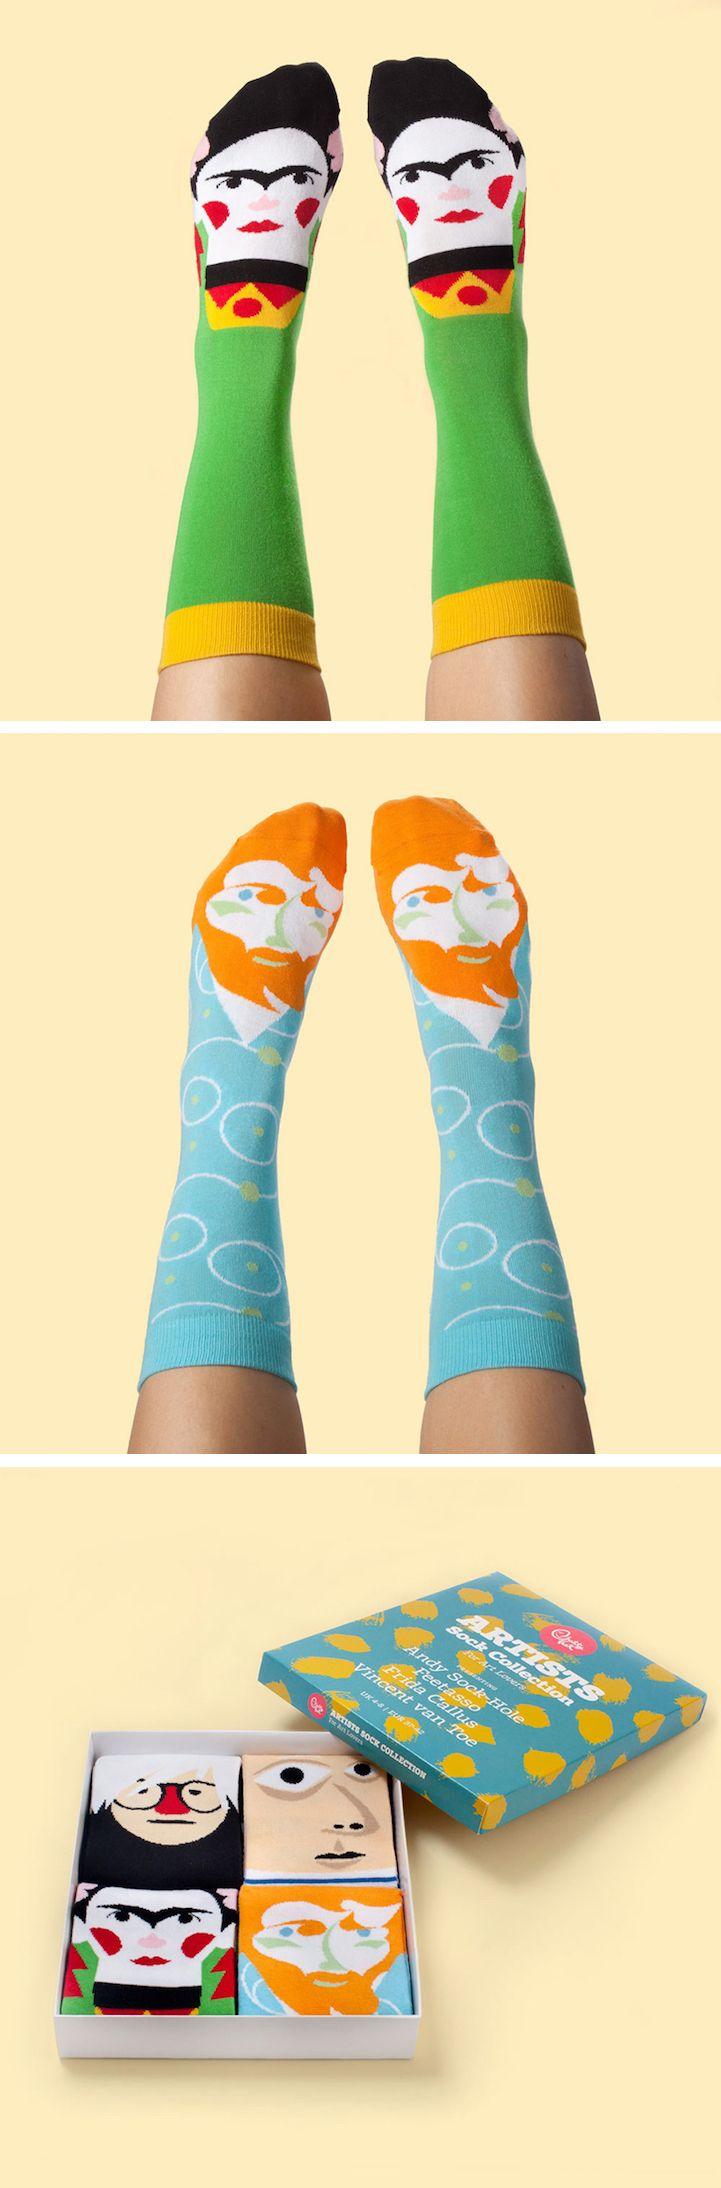 Chattyfeet Socks keep your feet cozy and creative!